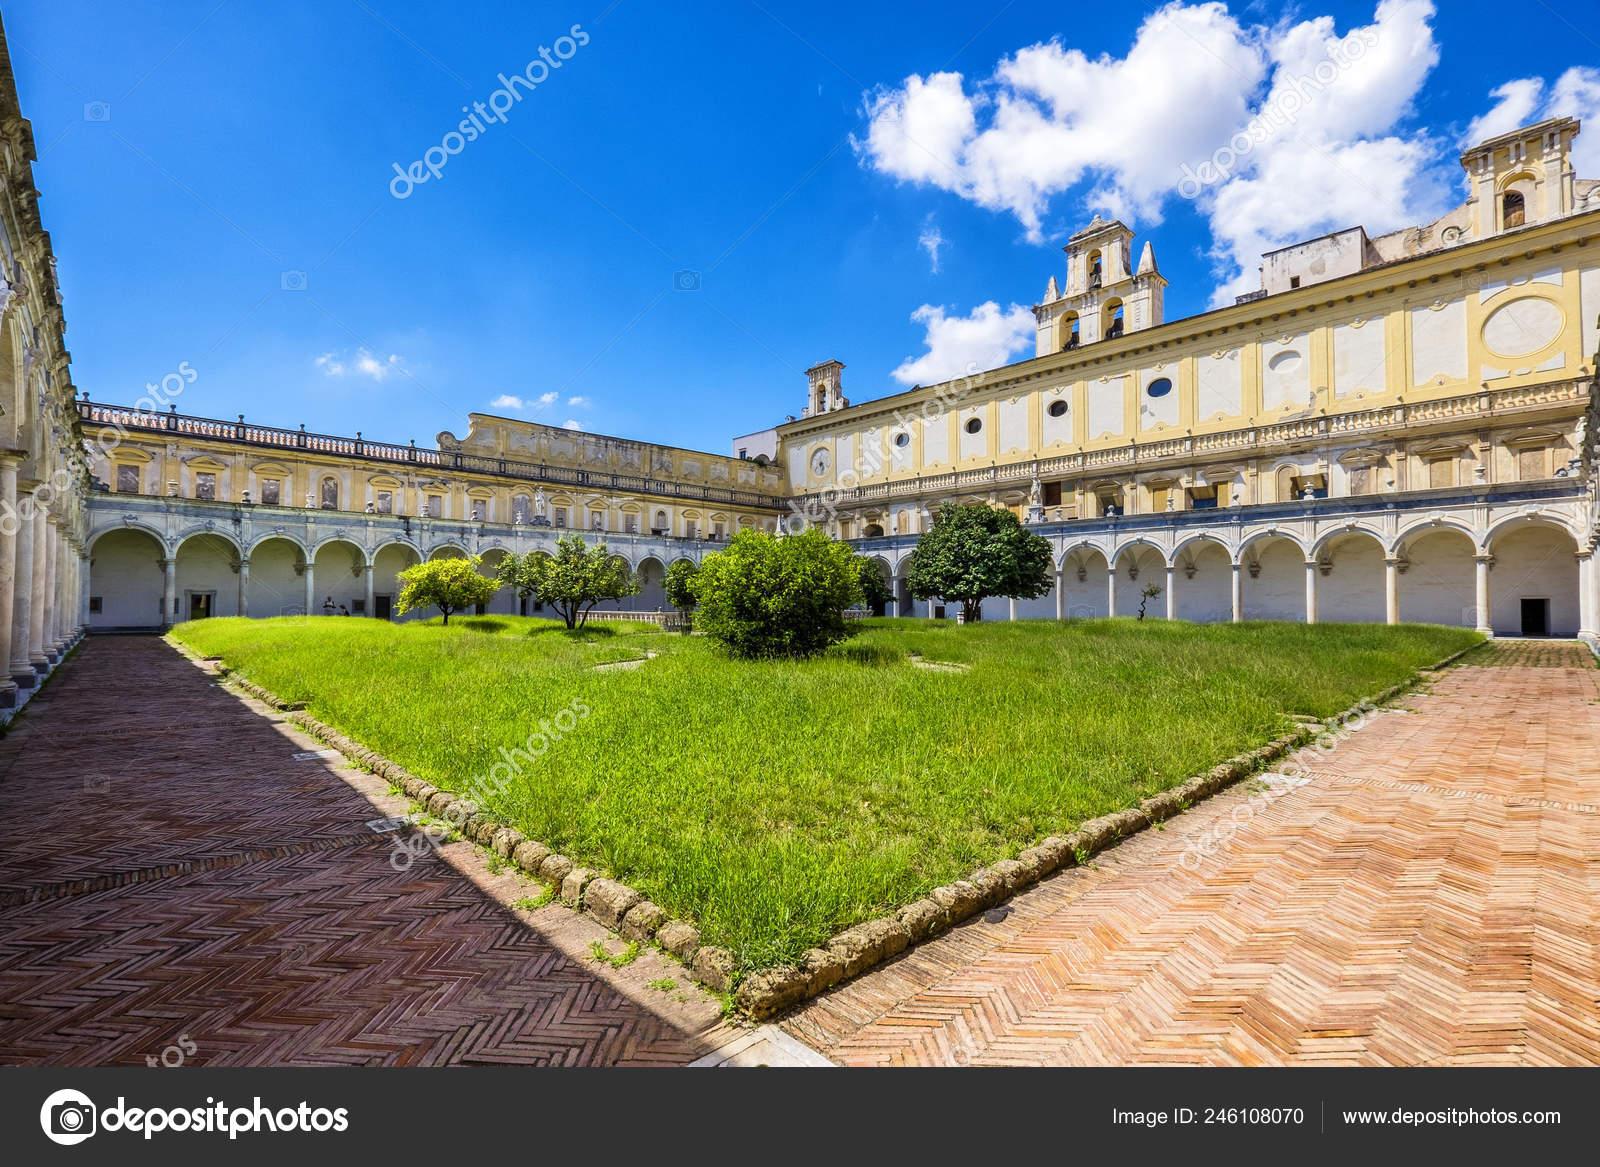 Beautiful Cloister Gardens San Martino Certosa San Martino Chartreuse Saint Stock Photo C Massimosanti 246108070